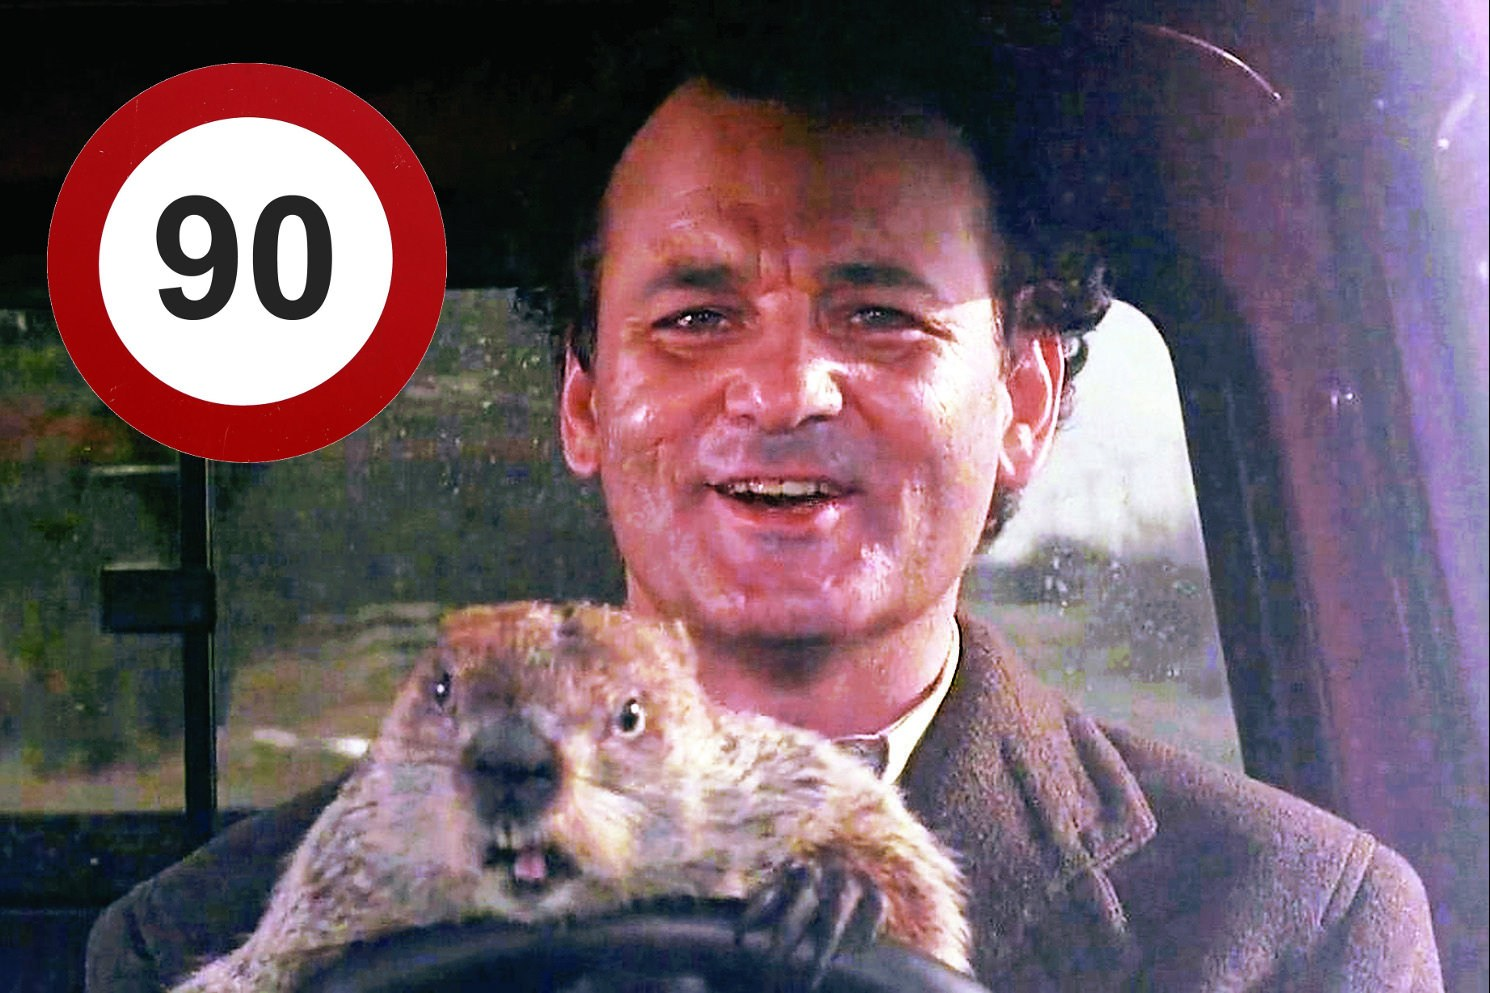 Mañana se aprueba la reducción a 90 km/h en vías secundarias